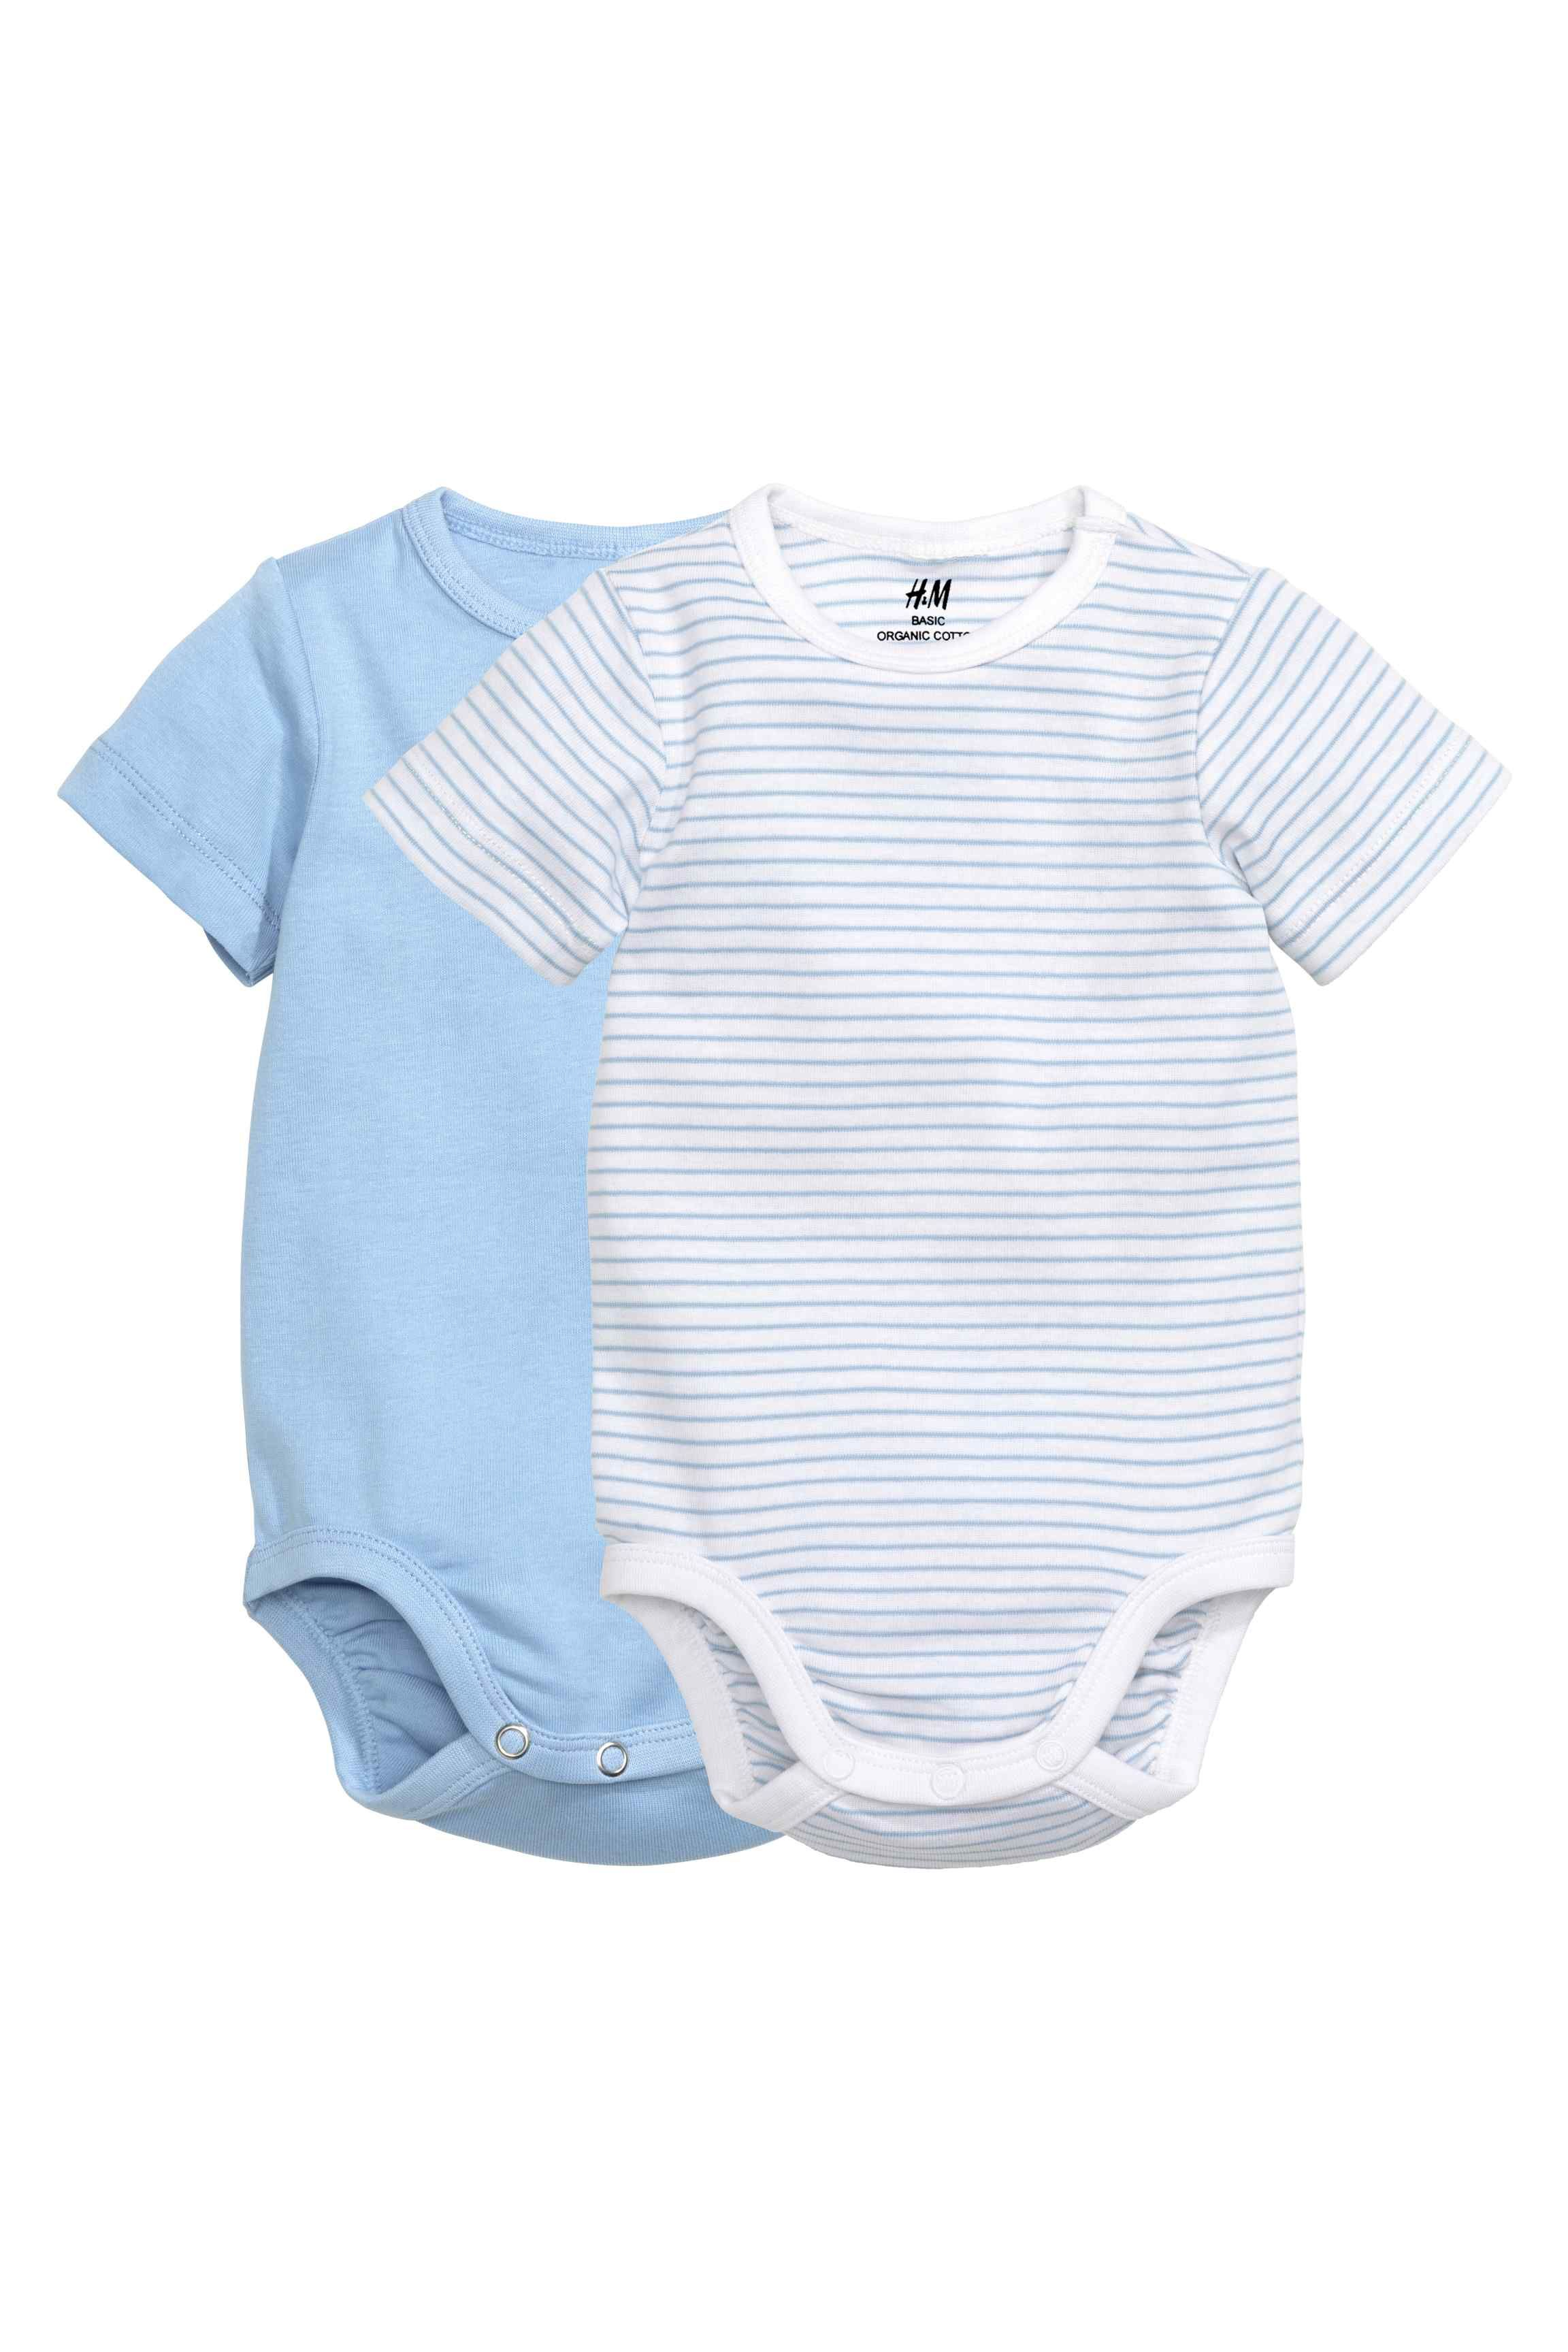 Body 2 Pak Babymode Baby Outfits Und Kinderkleidung